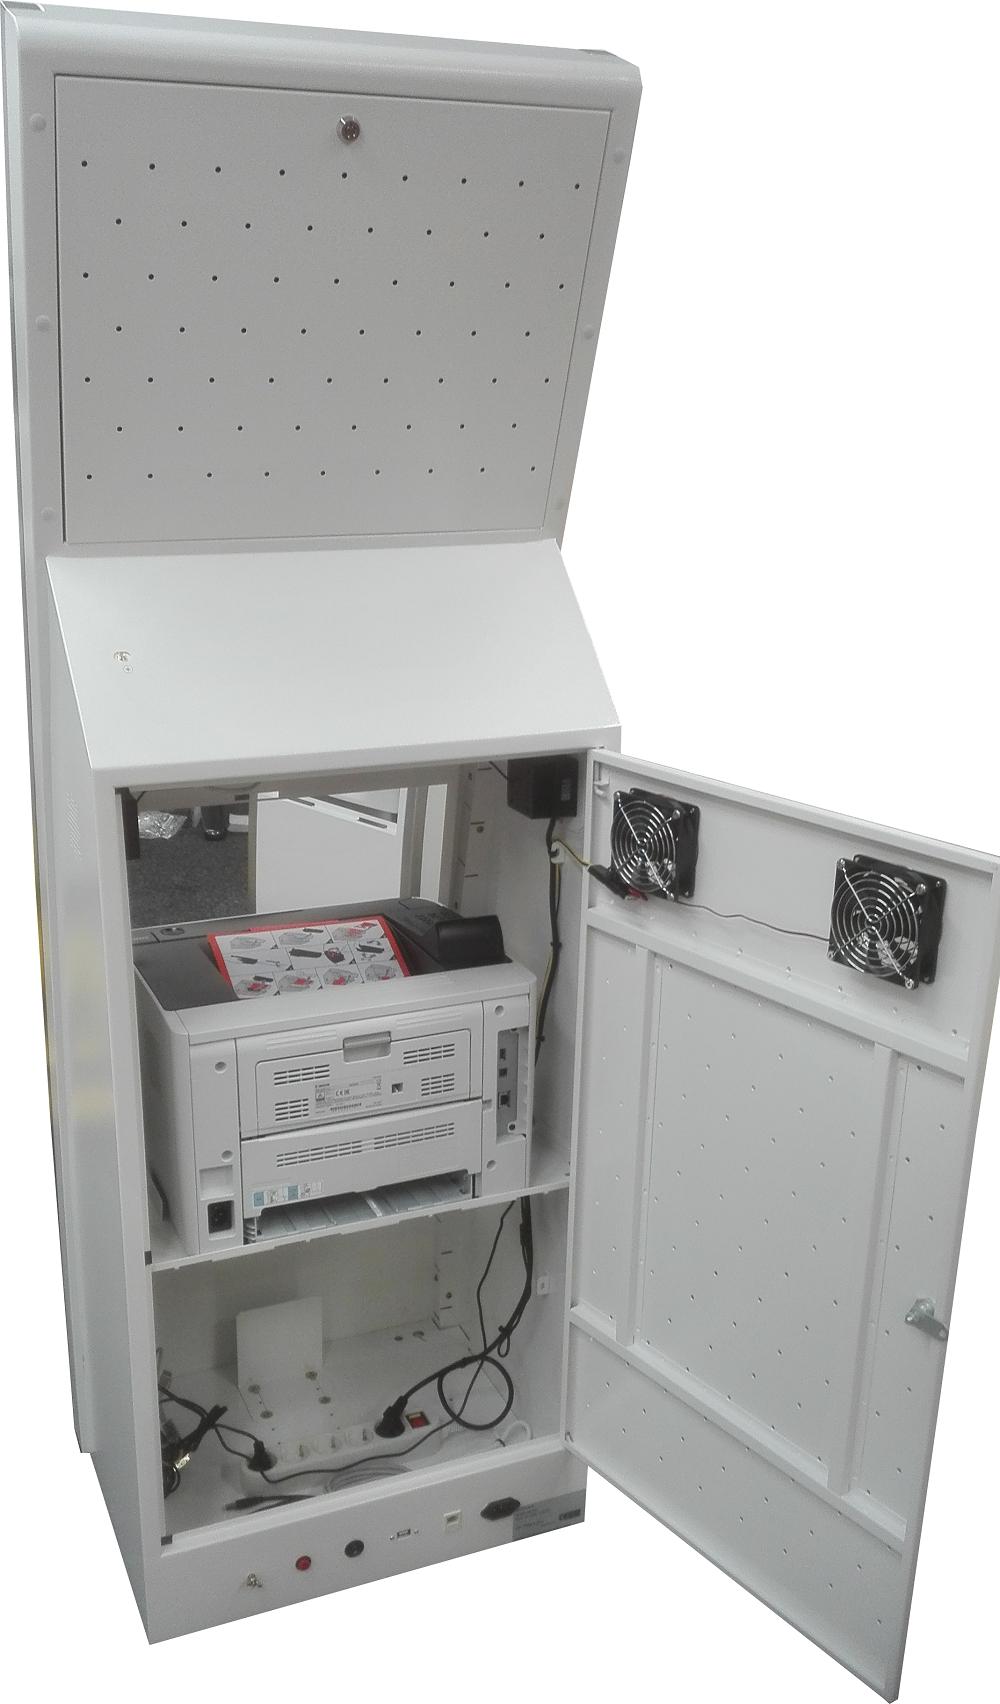 Interaktives Kiosk BM-K17 mit A4 Drucker